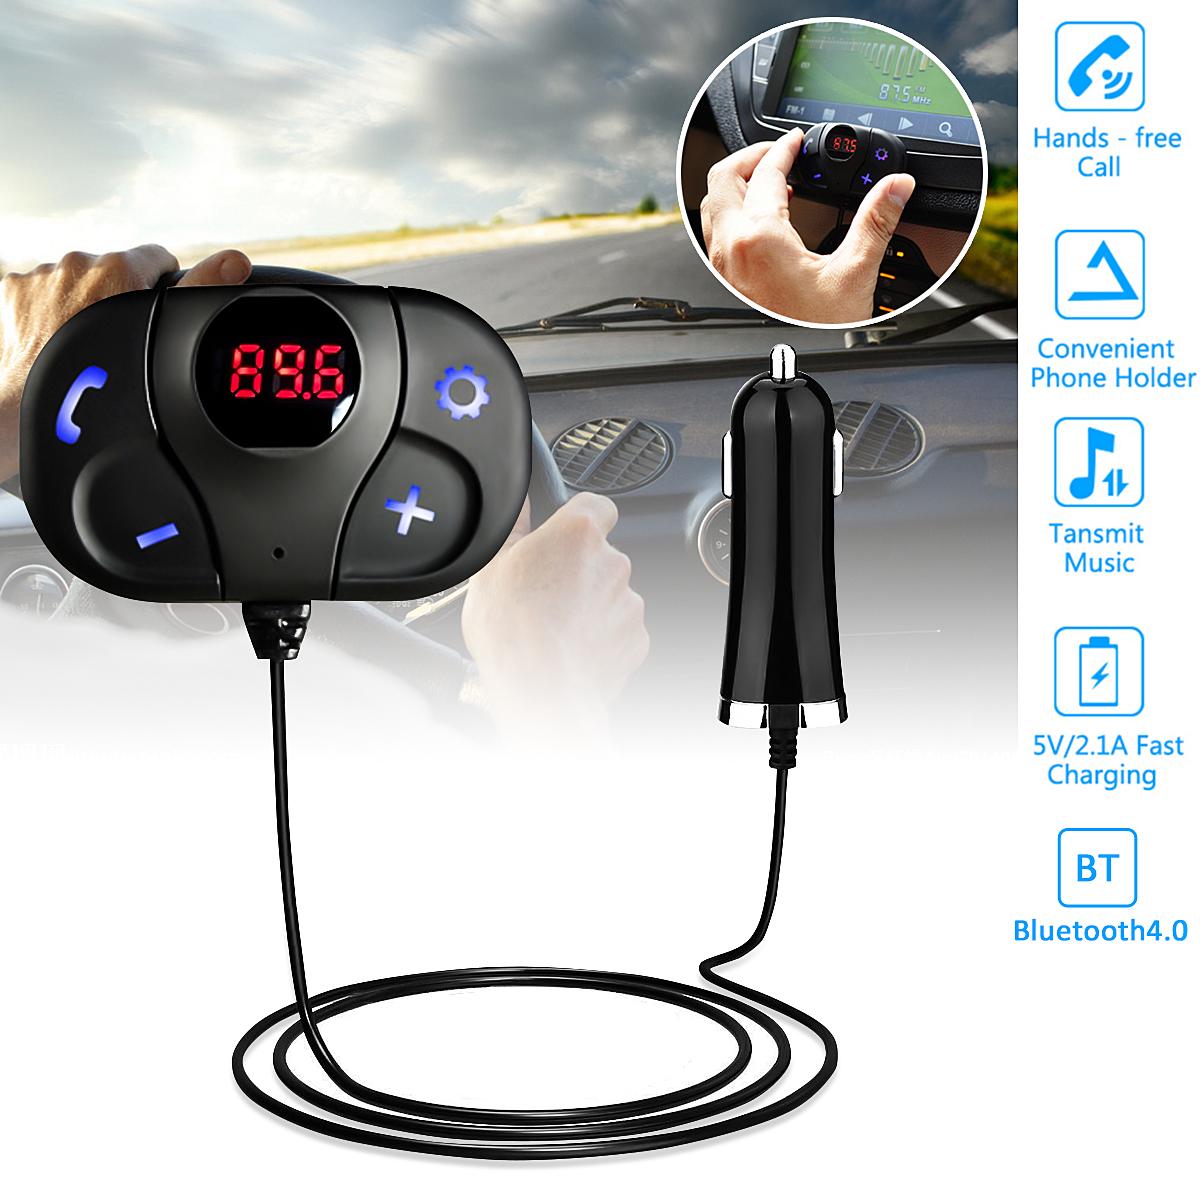 Bluetooth Car MP3 Player Wireless USB FM Transmitter Handsfree Radio Adapter Modulator with LED Display